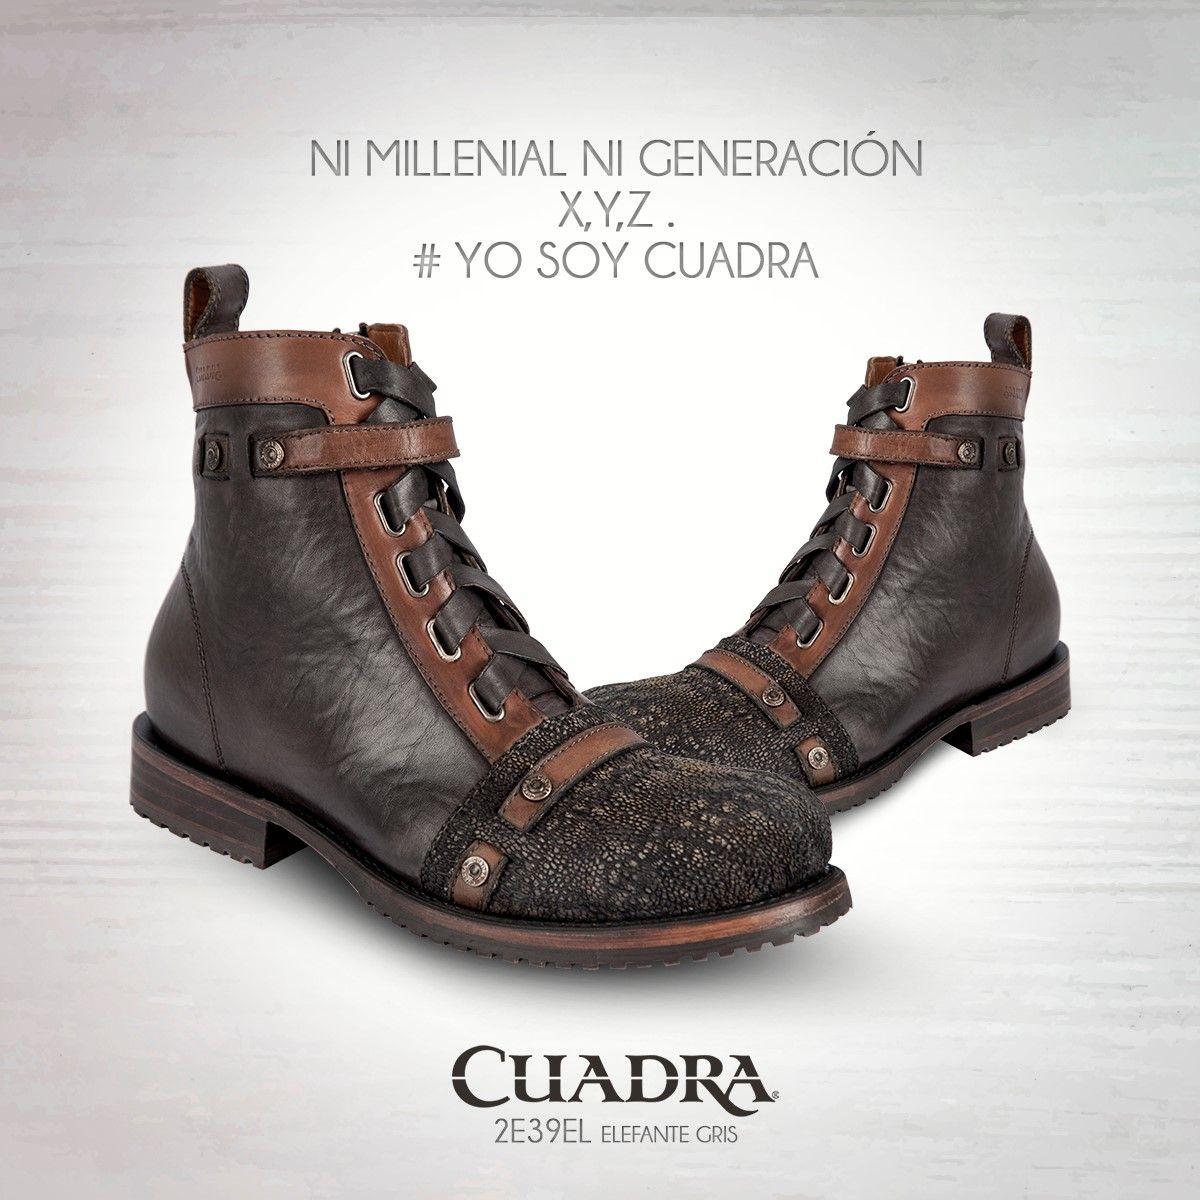 YoSoyCUADRA un estilo de vida.  CUADRA  Shoes  Boots ... 9f600e194967